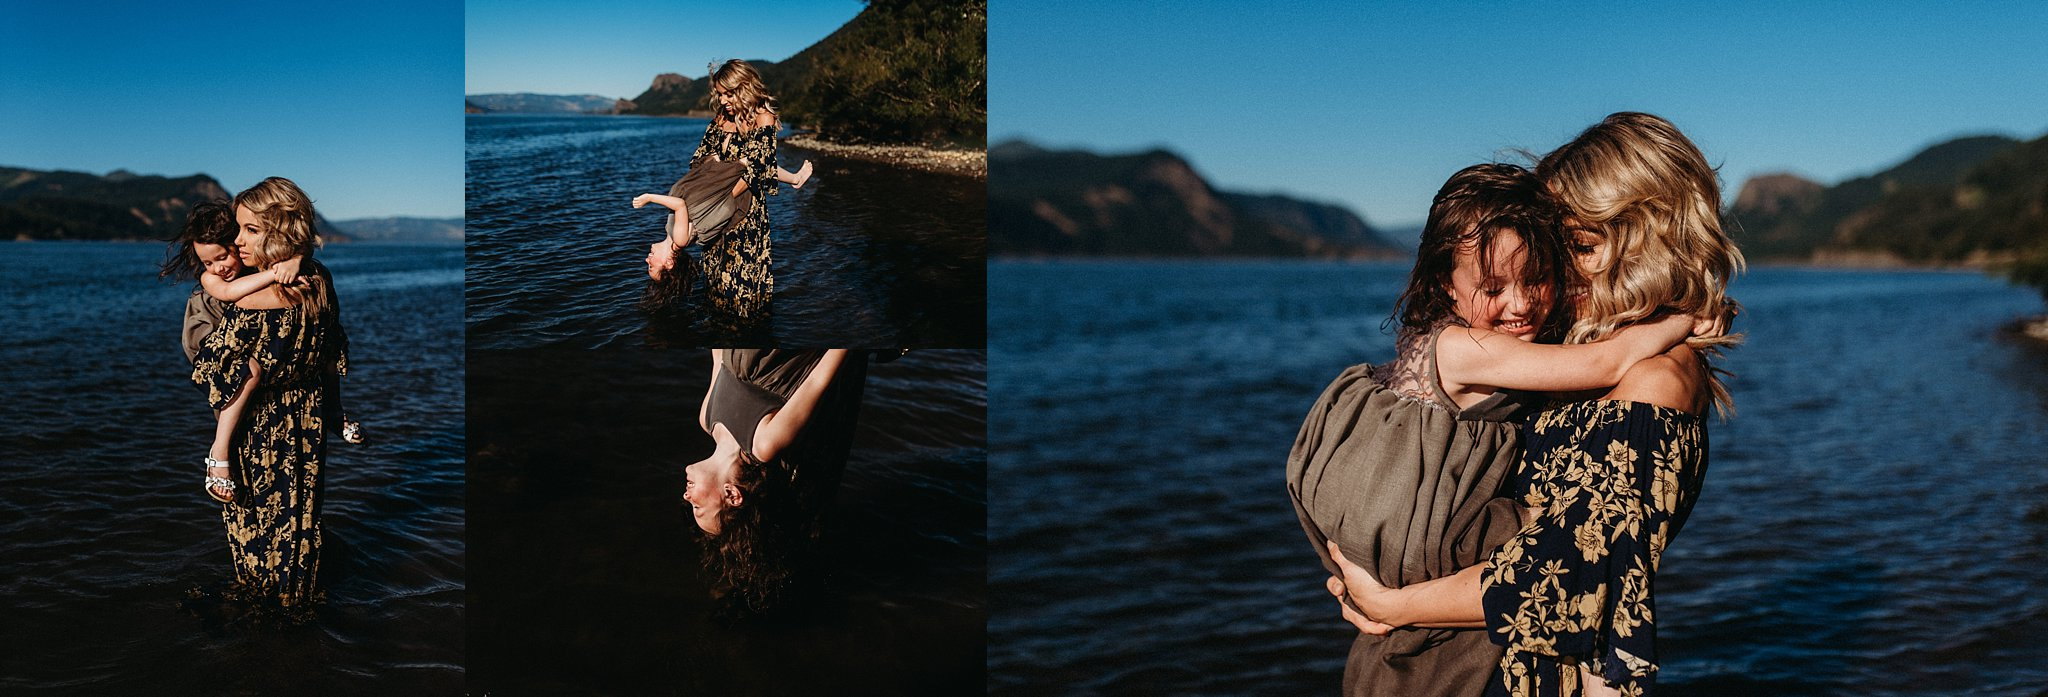 twyla jones photography - treasure coast florida - intimate couples session urban cowboy b&b | brooklyn New York_0061.jpg